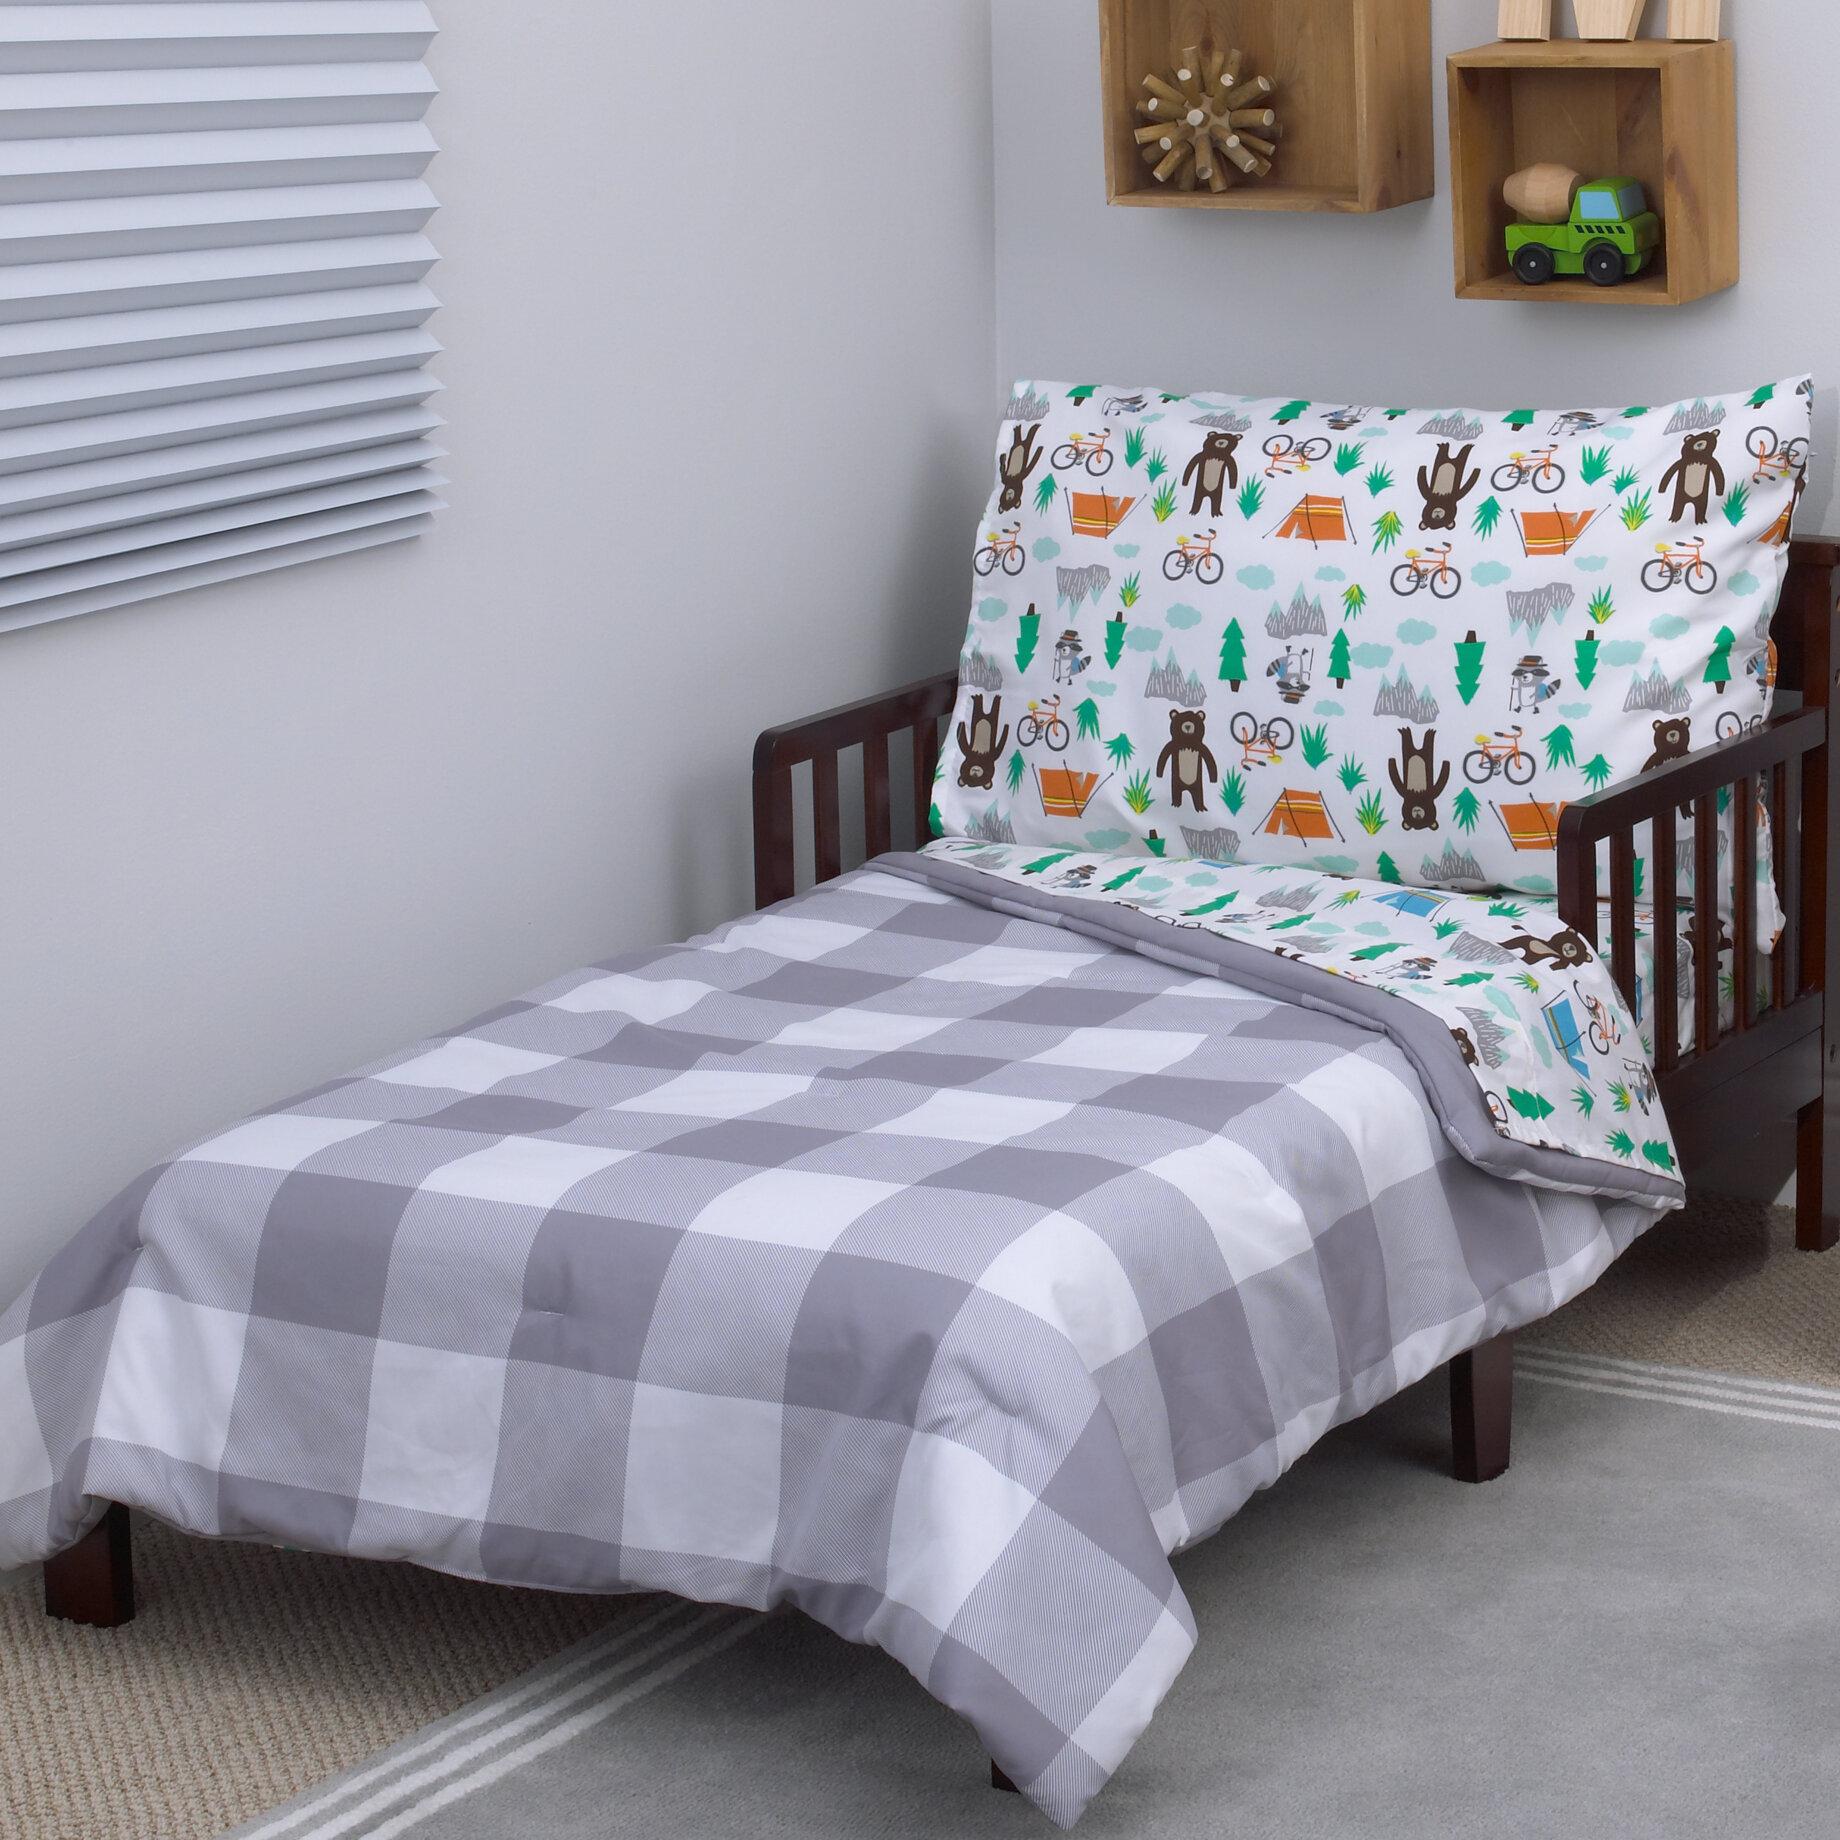 Carter\'s Woodland Boy 4 Piece Toddler Bedding Set | Wayfair